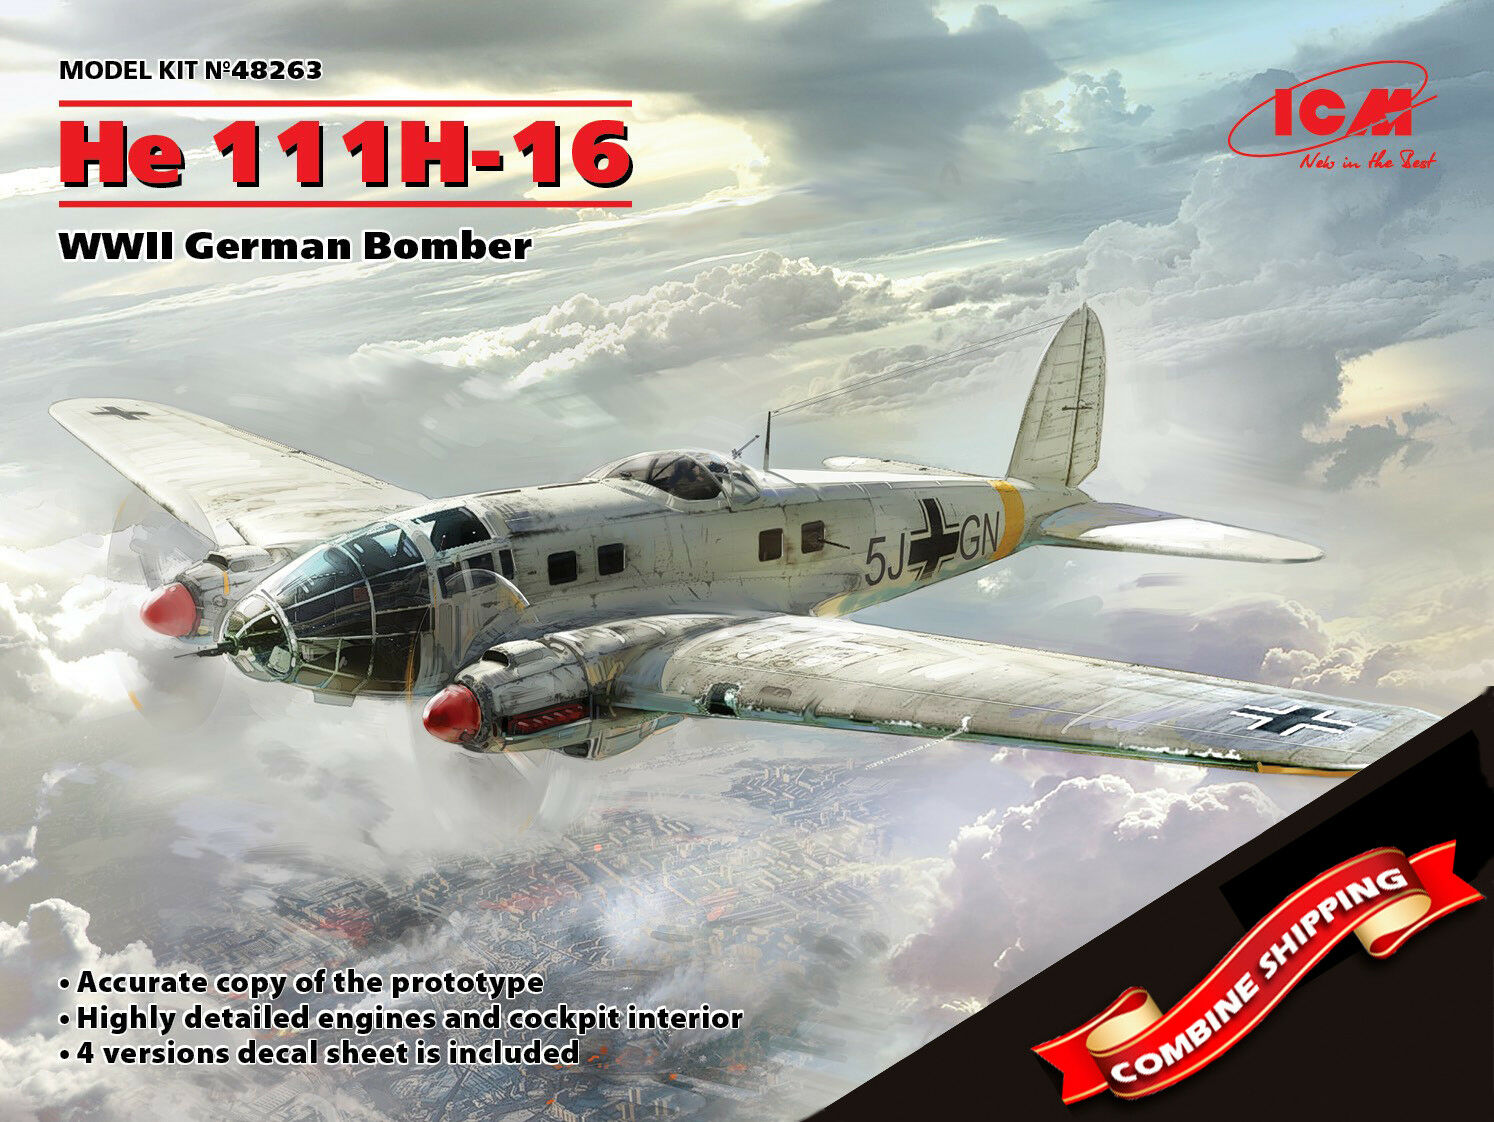 ICM 48263 Heinkel He 111H-16, WWII German Bomber, scale plastic model kit 1 48